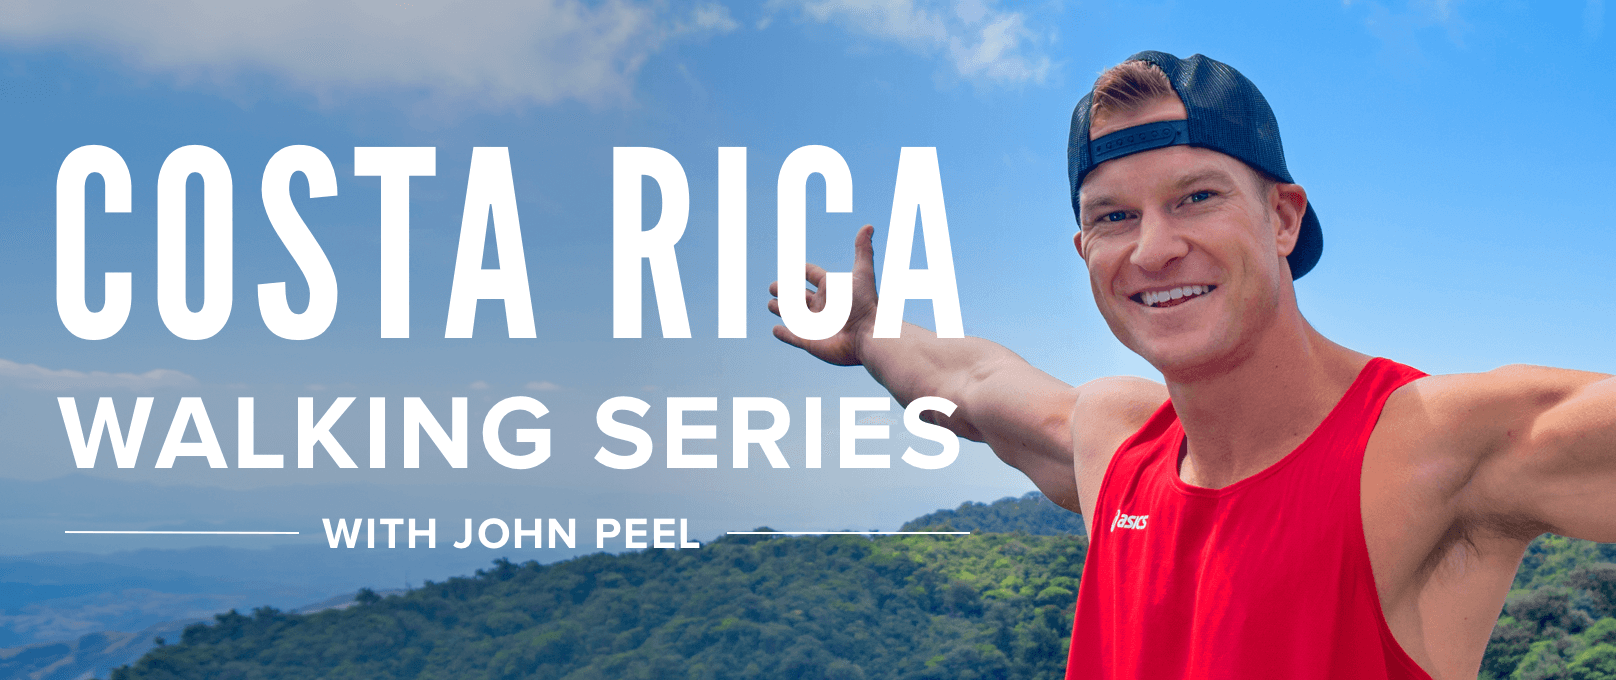 iFit Costa Rica Walking Series with John Peel walking workouts